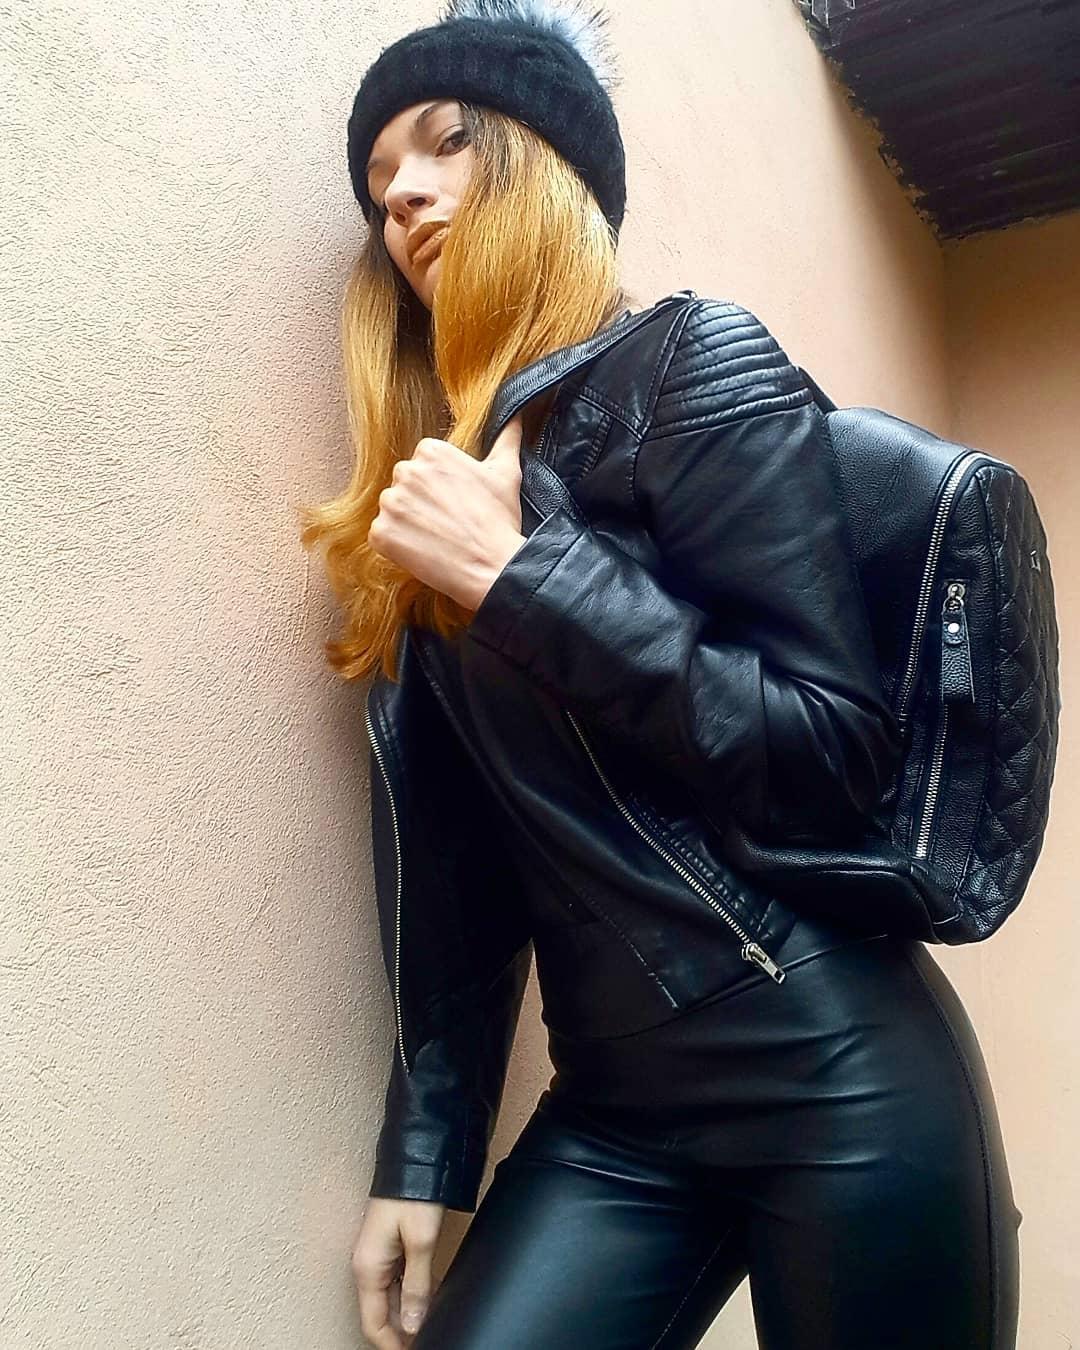 Olga-Madych-Wallpapers-Insta-Fit-Bio-15